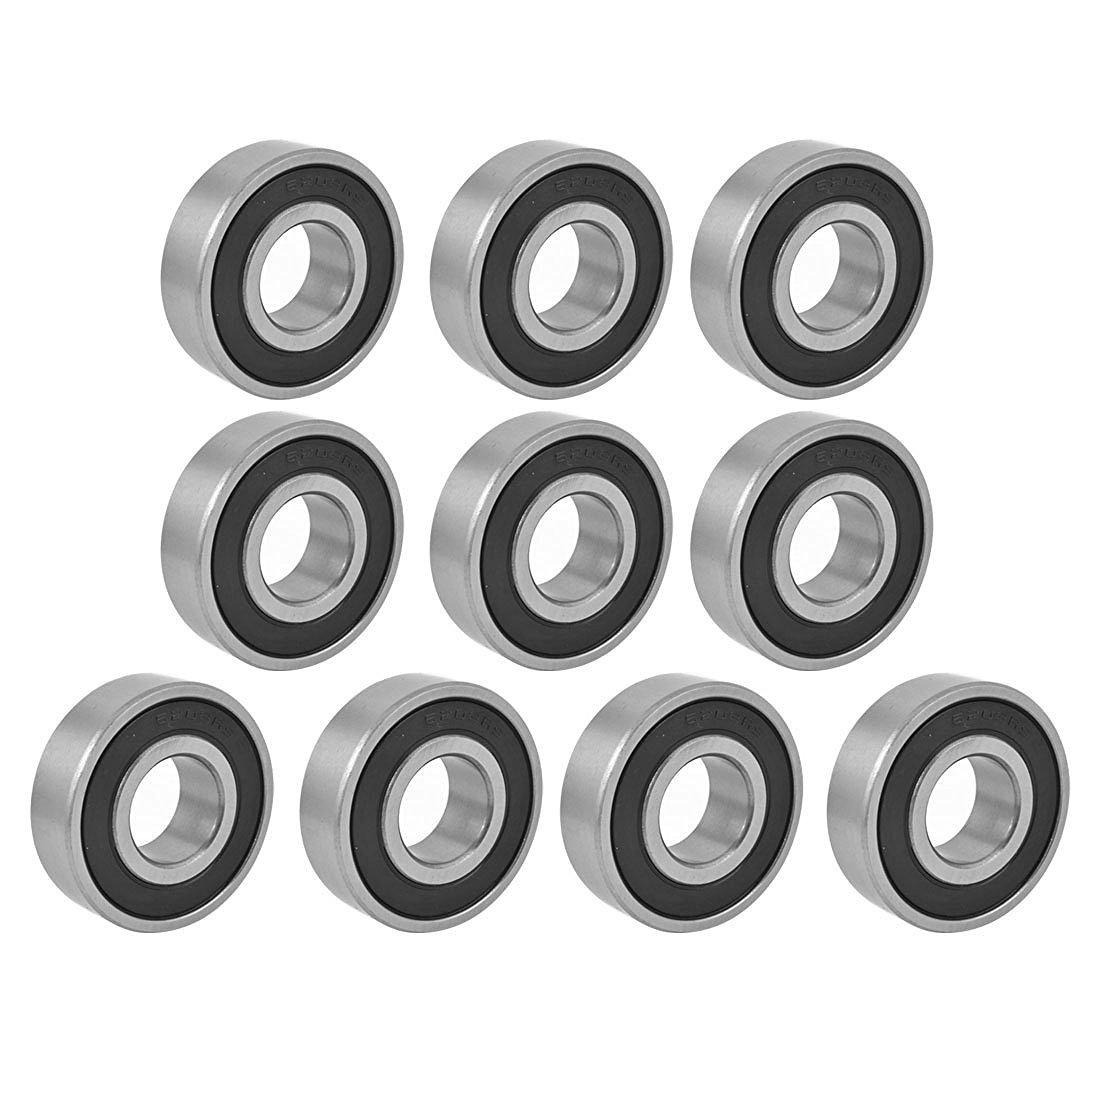 Ball Bearings - TOOGOO(R) 6203RS Shielded Deep Groove Radial Ball Bearings 17mmx40mmx12mm 10Pcs